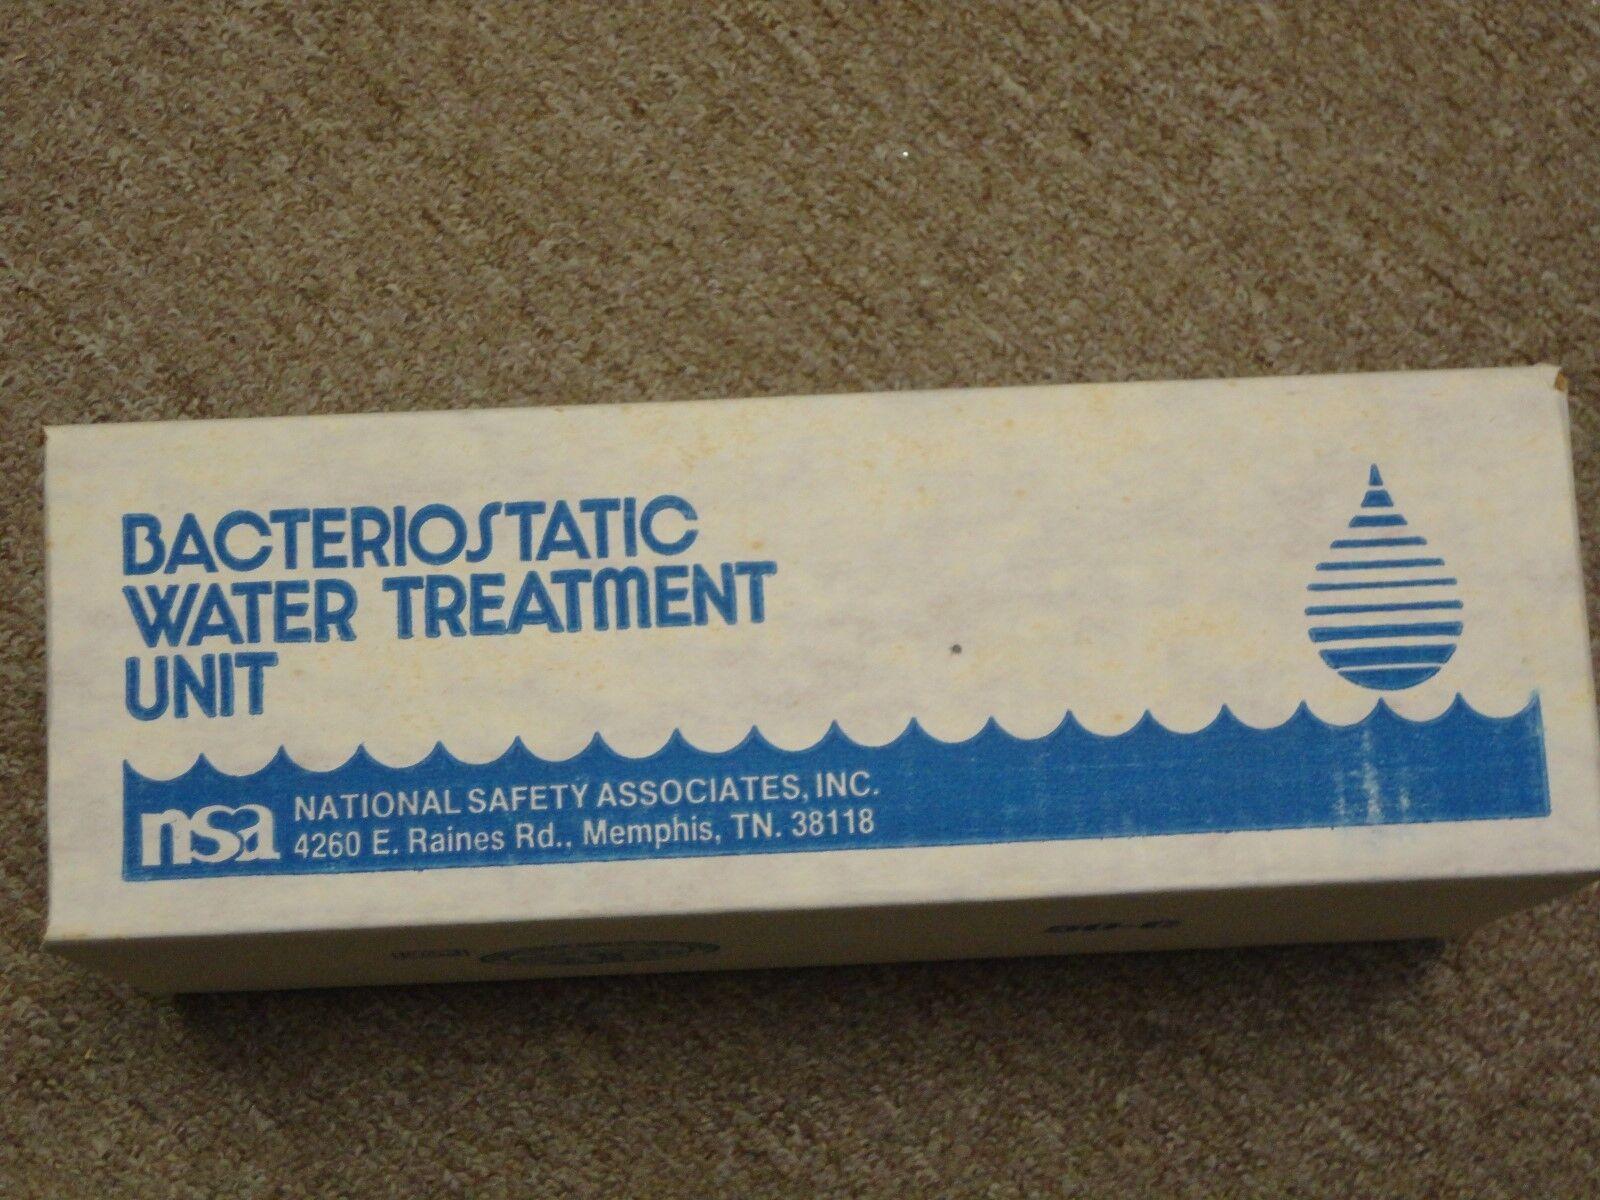 NSA Model C Bacteriostatic Water Treatment Unit   - New in box